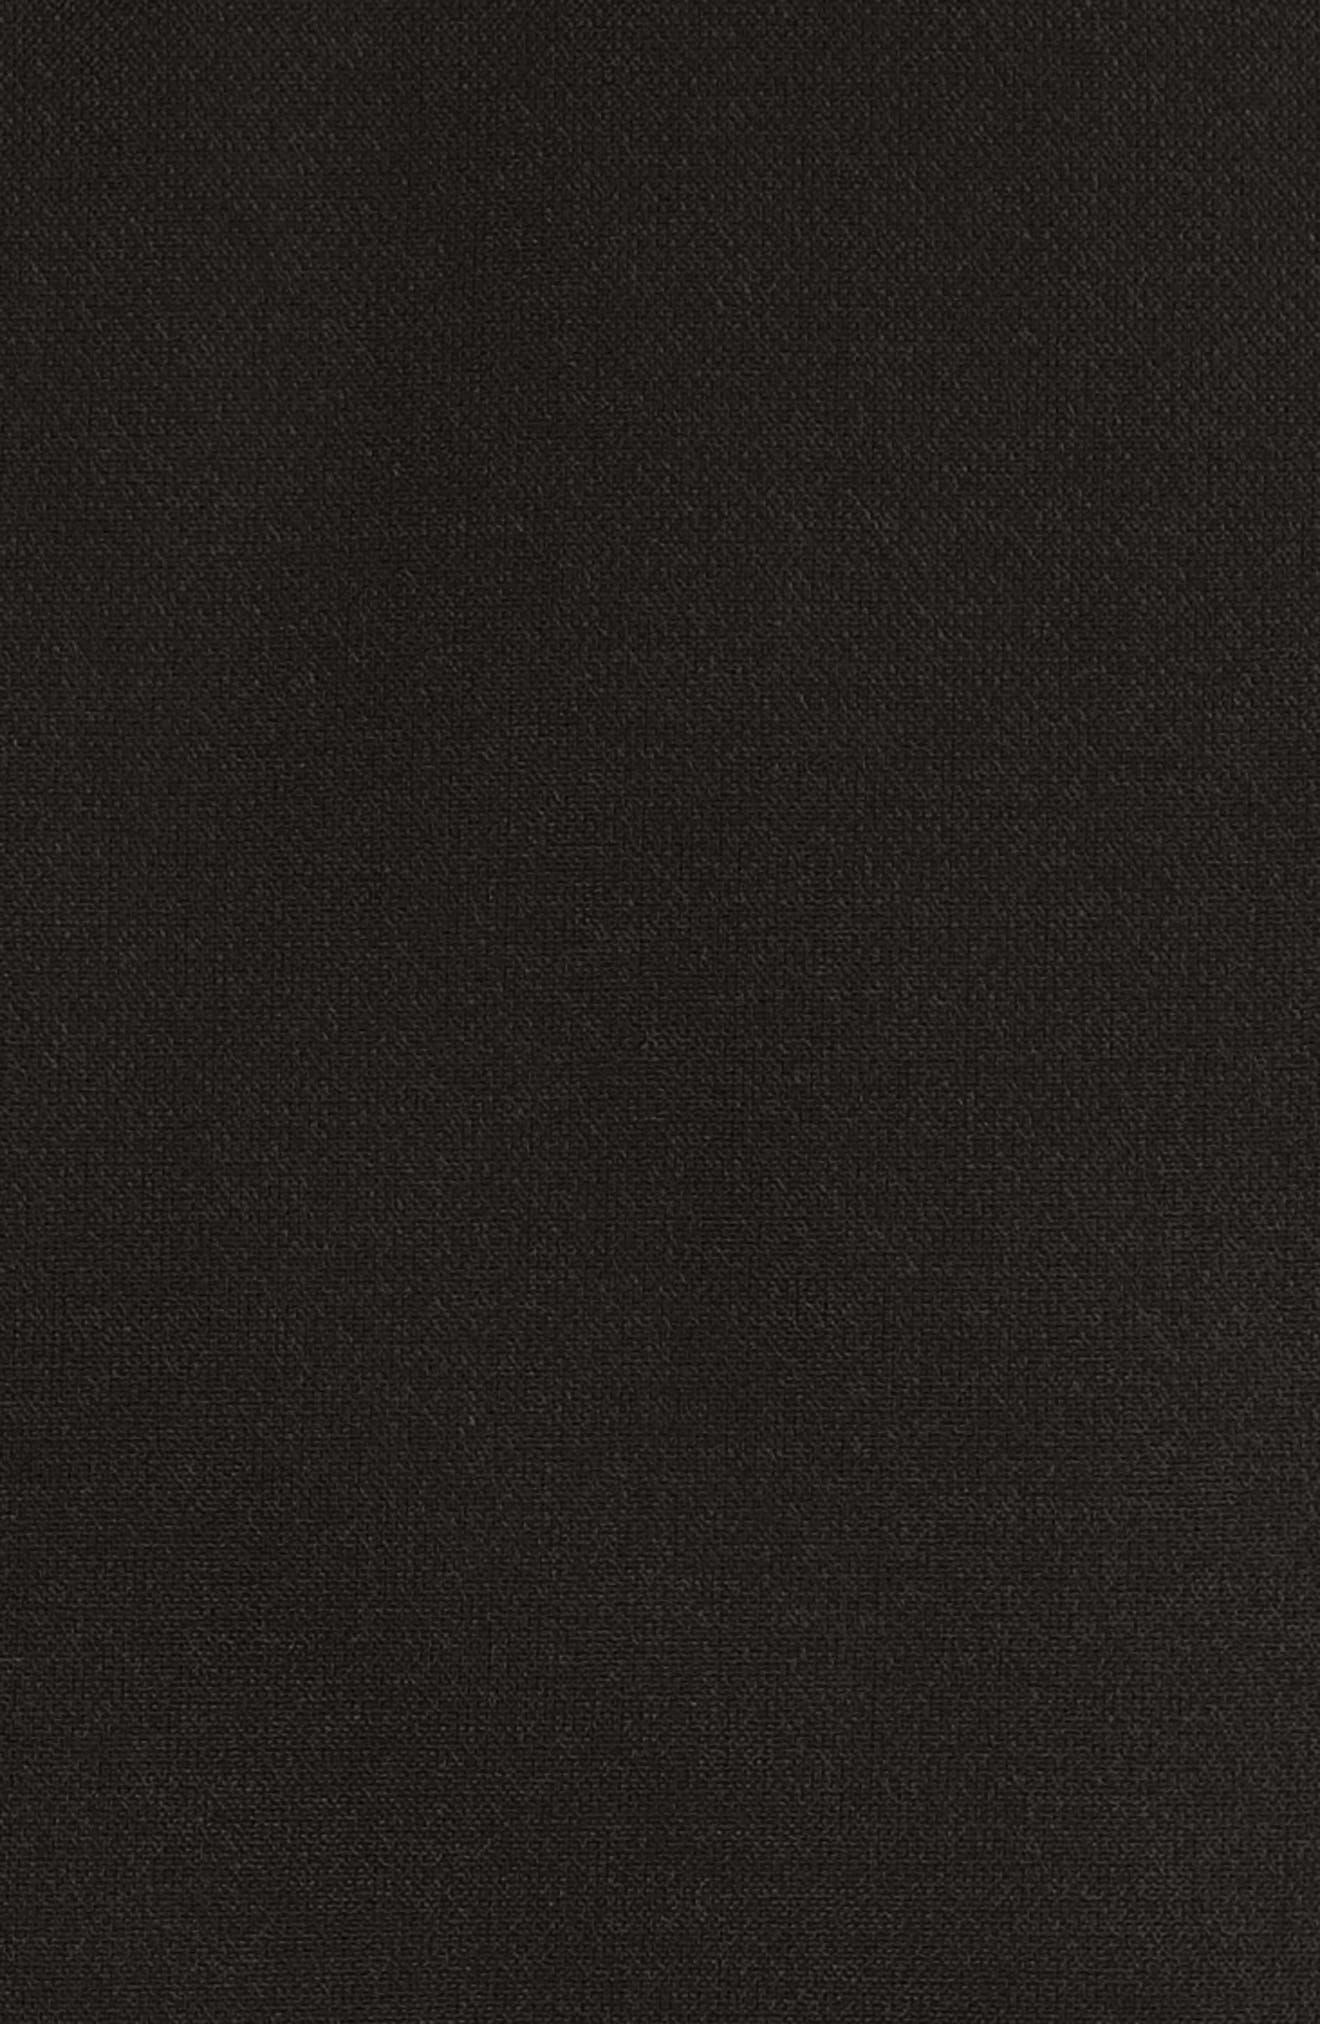 VERSACE COLLECTION, Stretch Cady Sheath Dress, Alternate thumbnail 6, color, BLACK